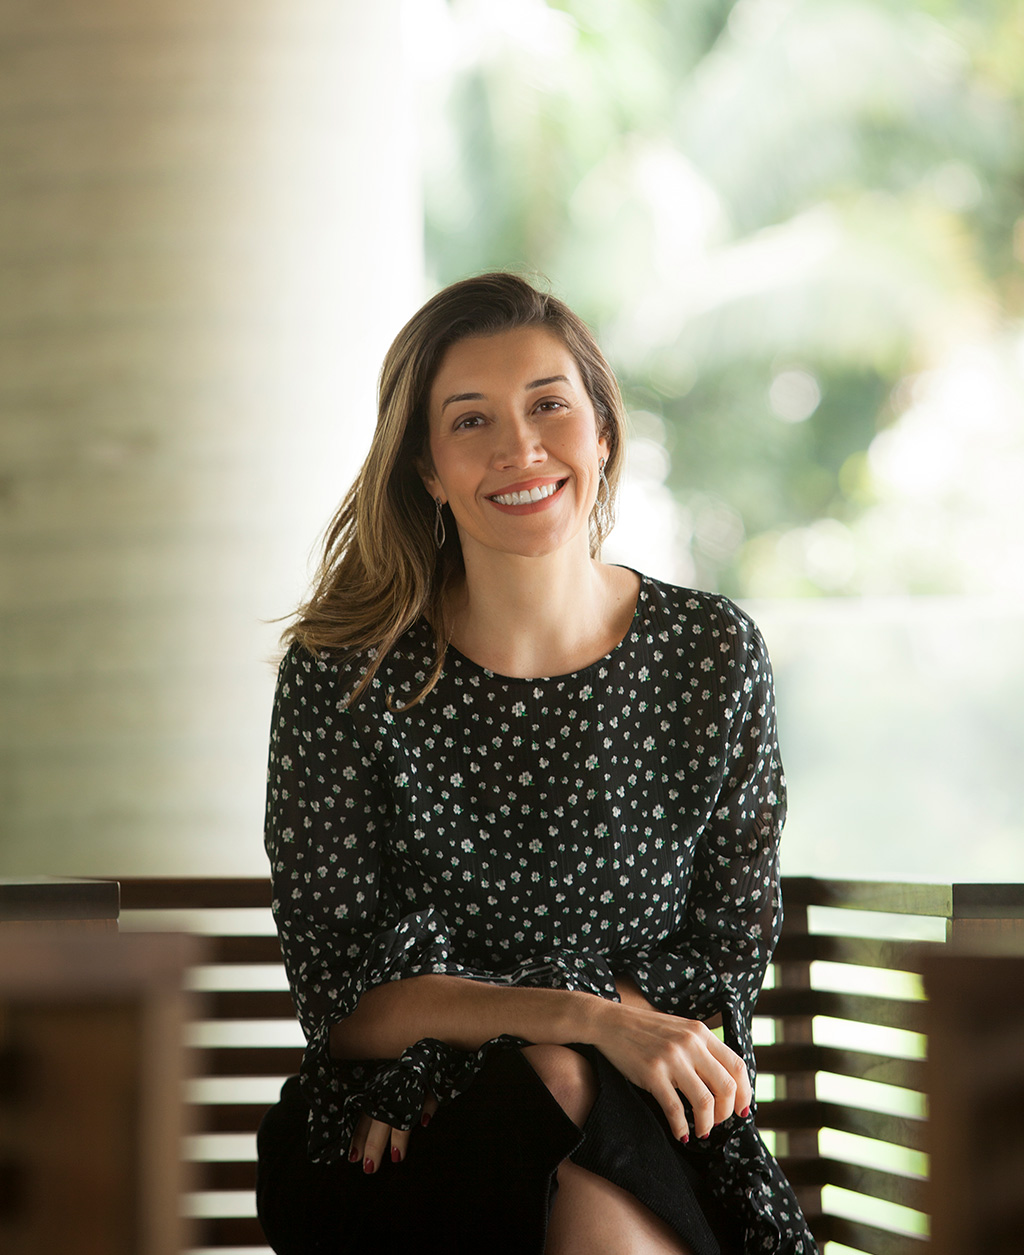 Paula Andrade , vice-presidente de varejo da Natura & Co - Revista Shopping Centers